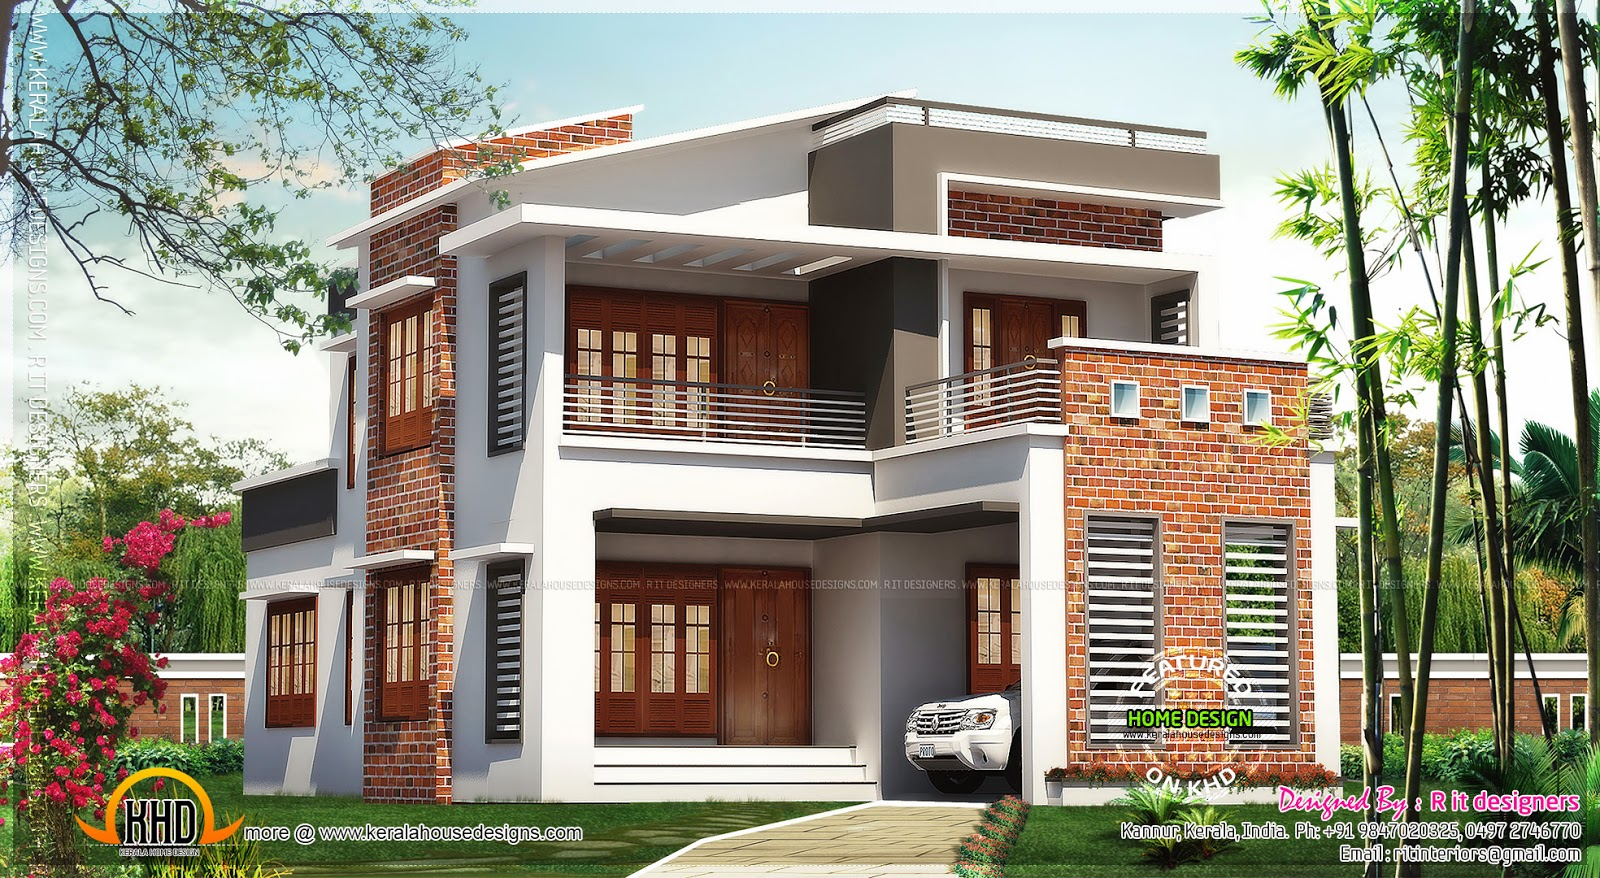 Brick Mix House Exterior Design Kerala Home Design And Floor Plans